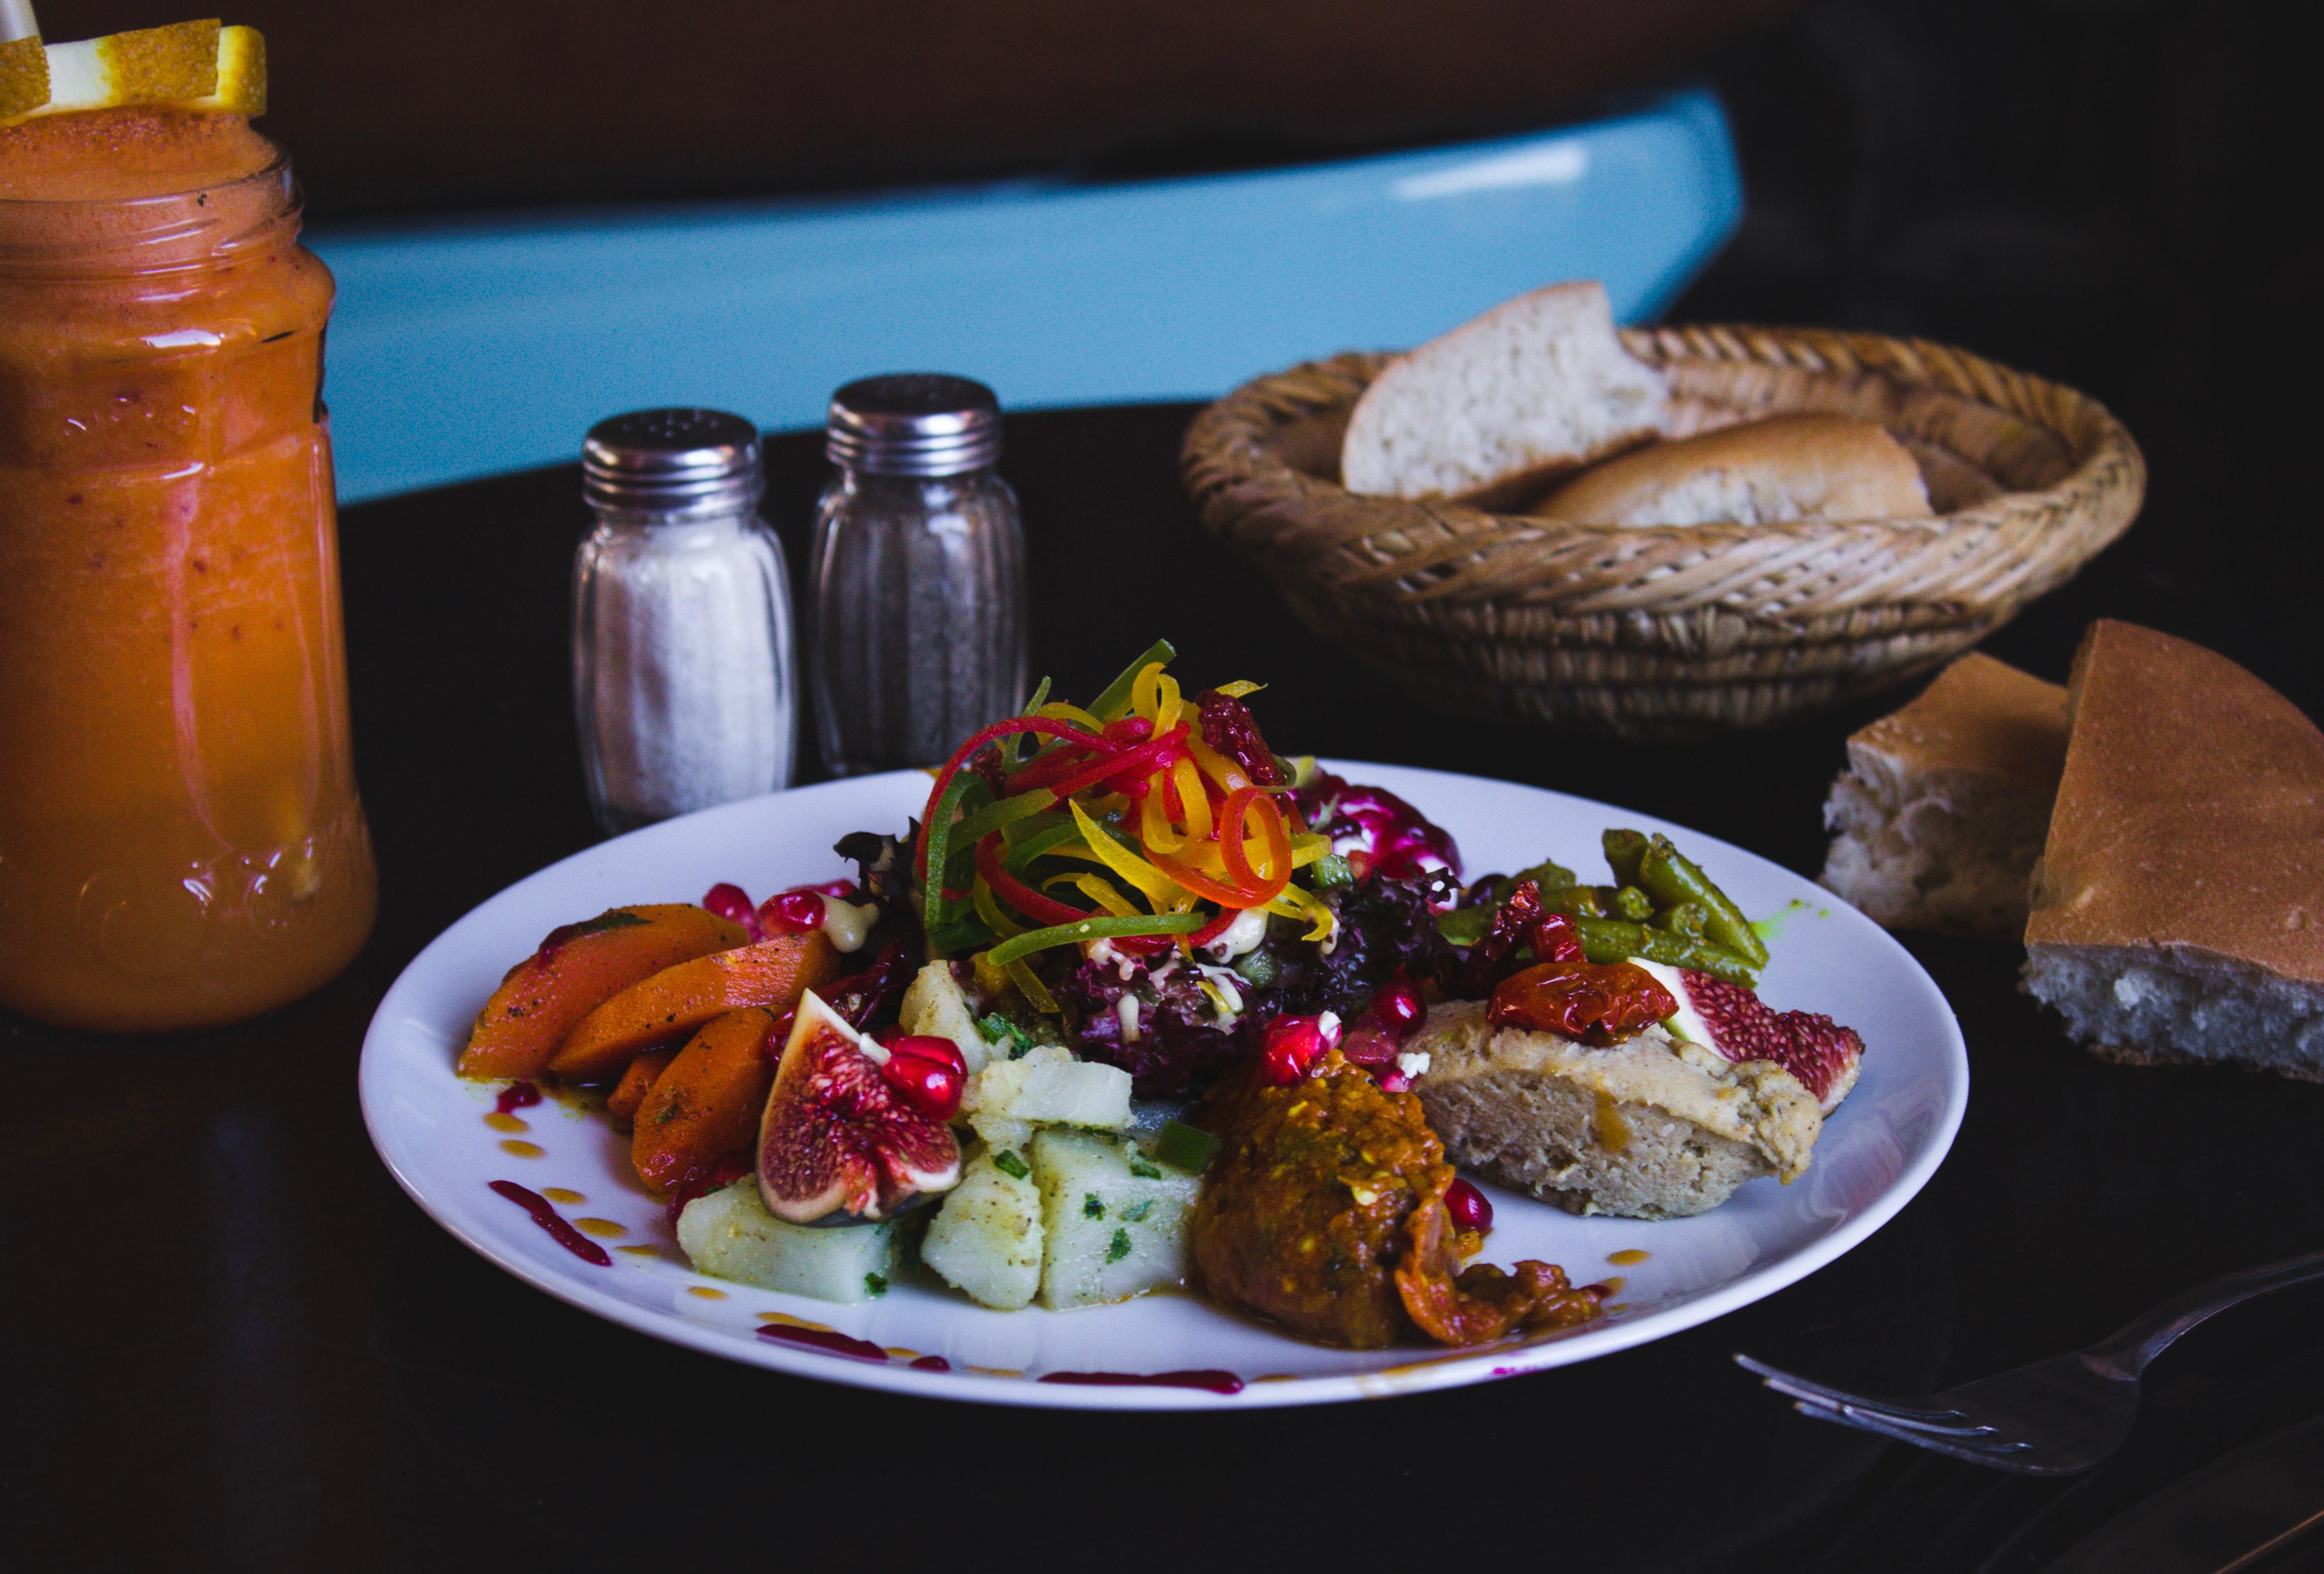 repas syrien - Unsplash - Louis Hansel